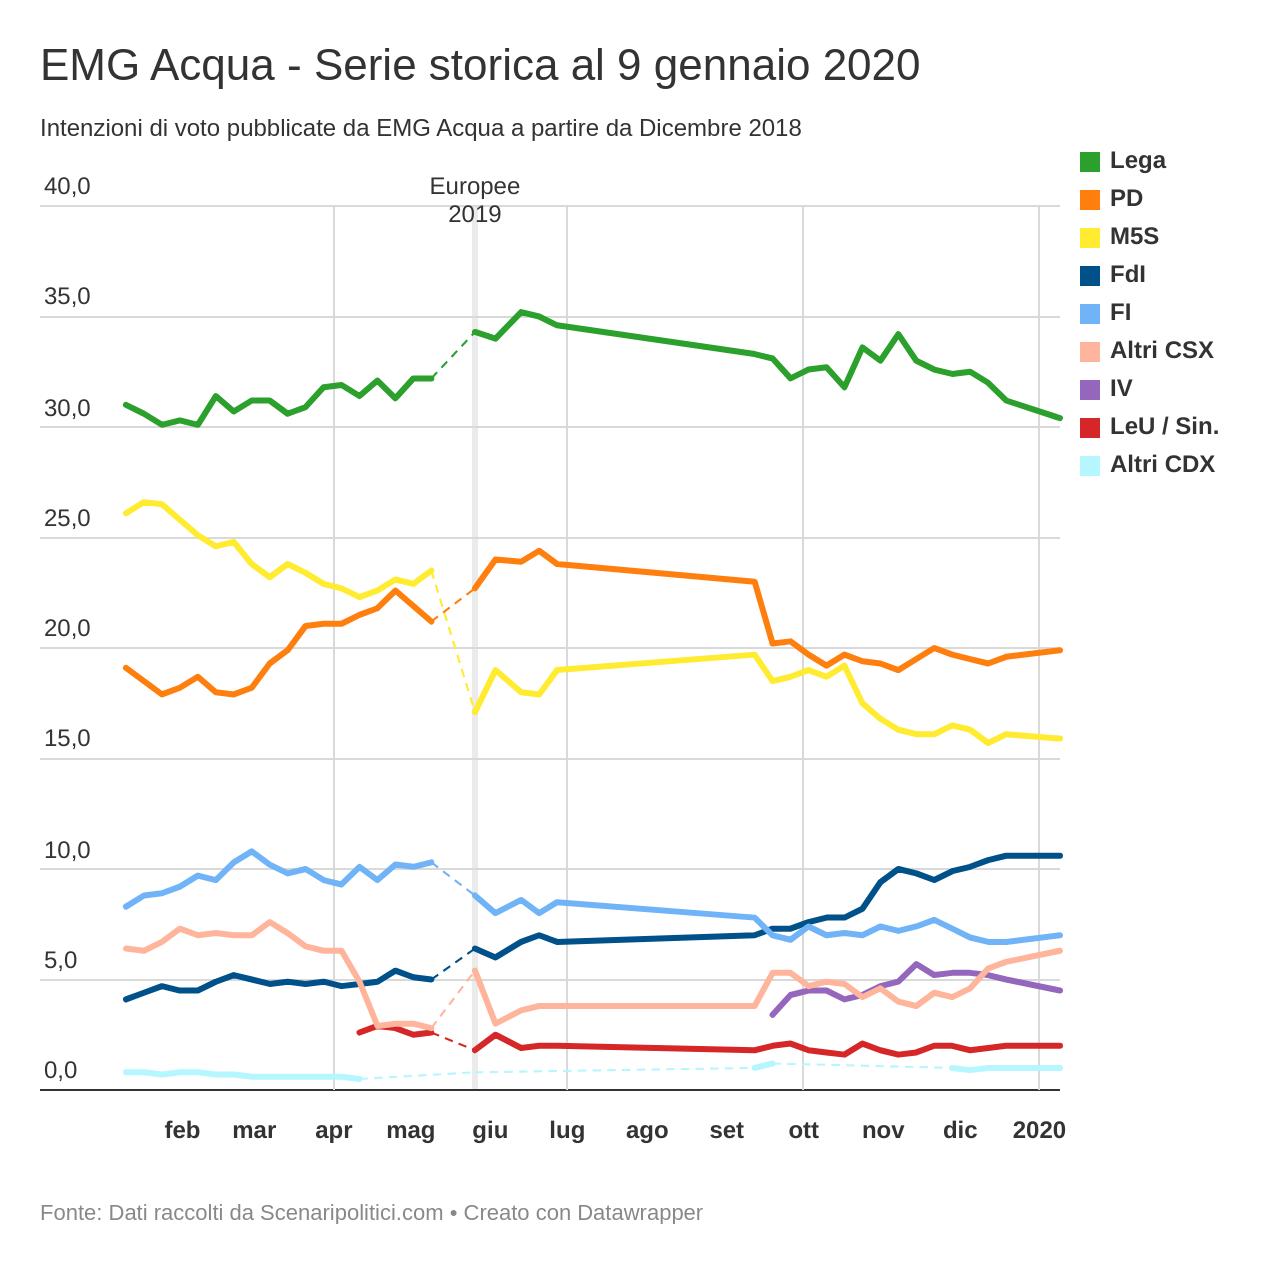 Sondaggio EMG Acqua 9 gennaio 2020